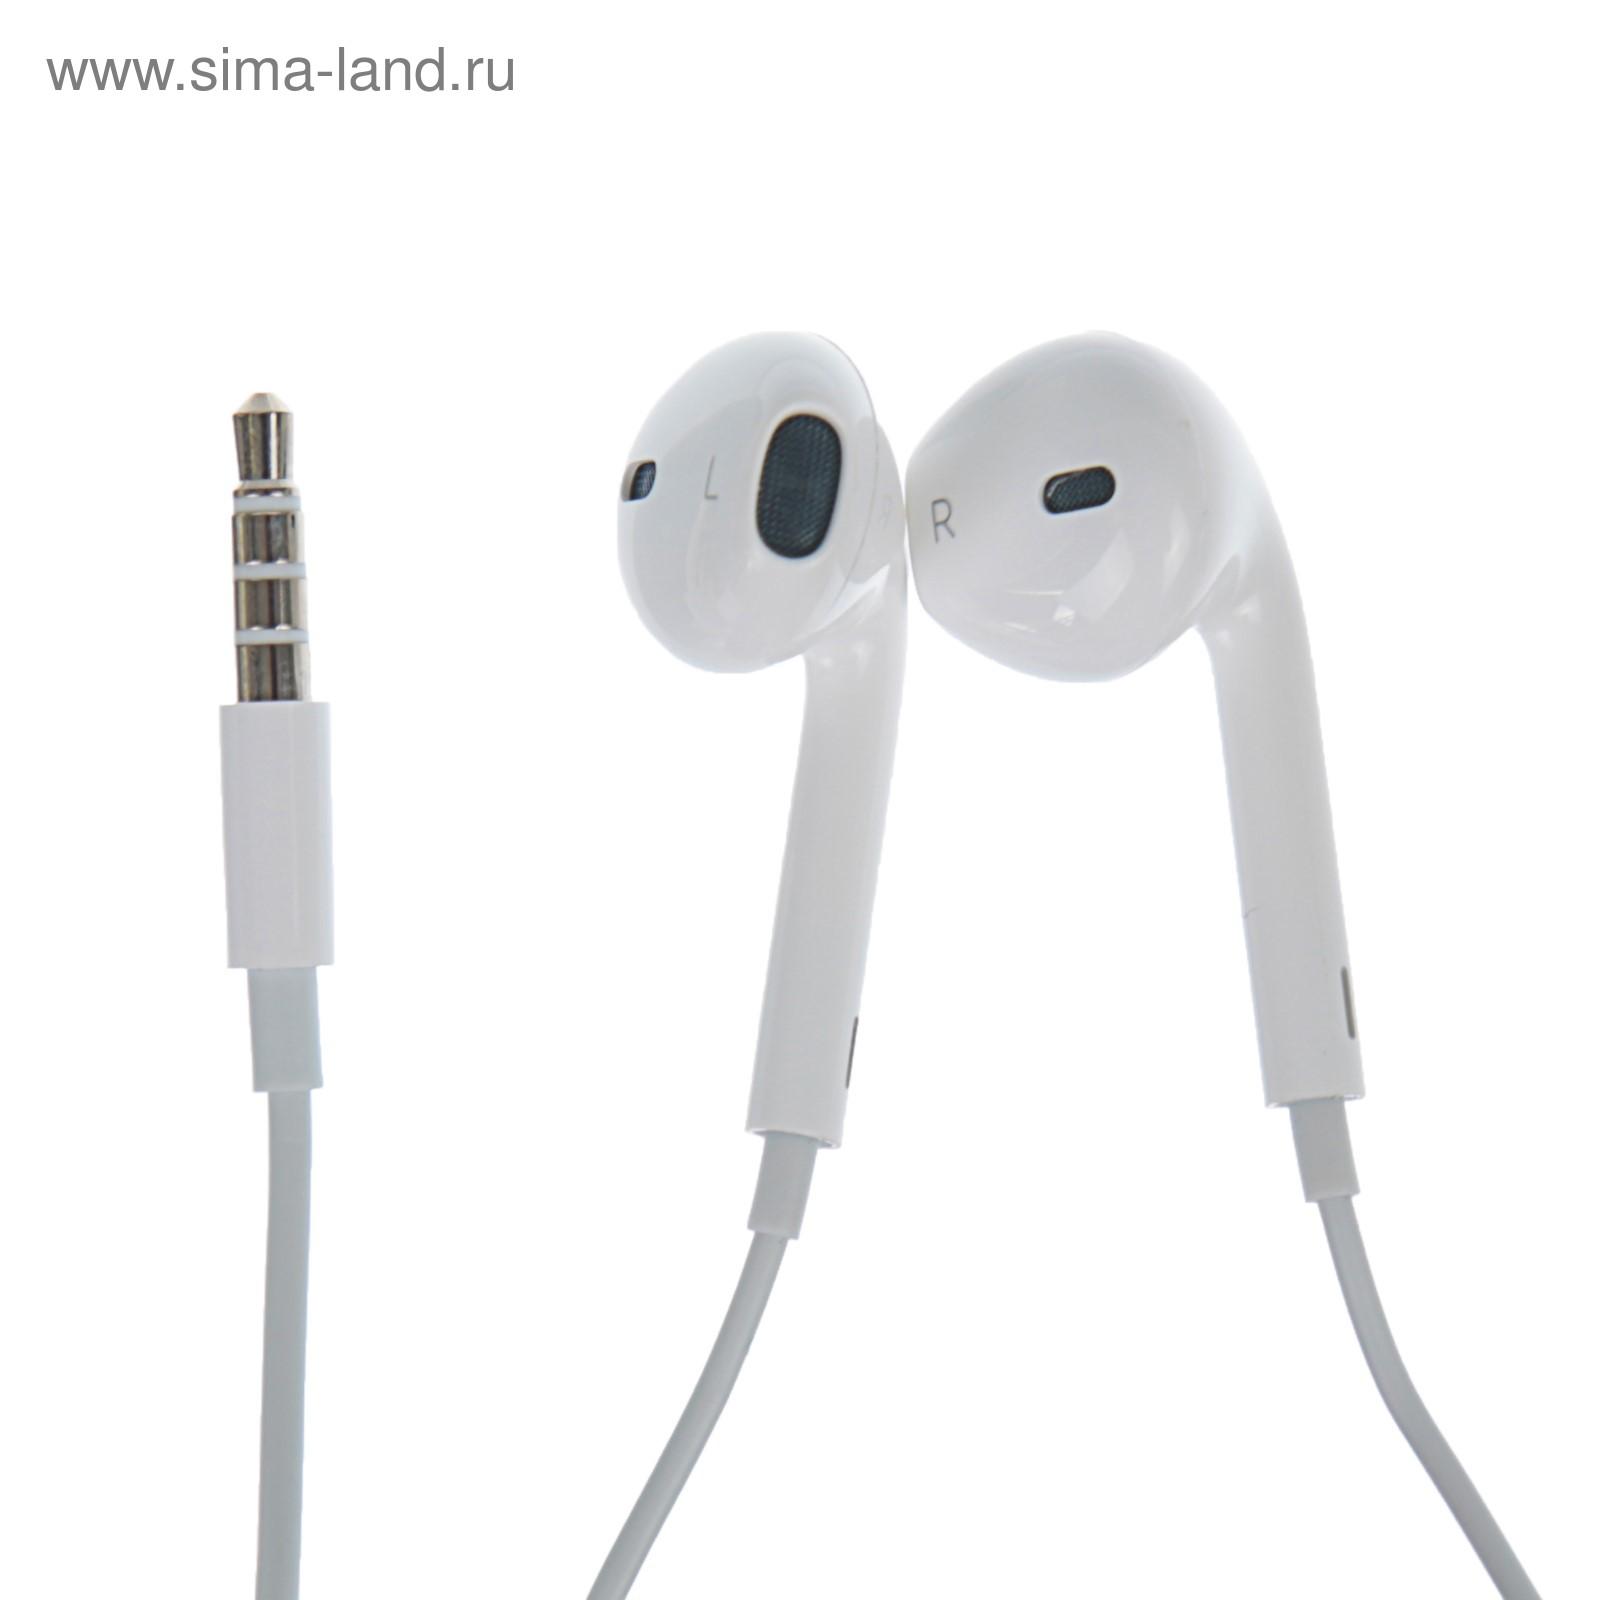 Наушники с микрофоном Apple EarPods dbde94ac47b6e